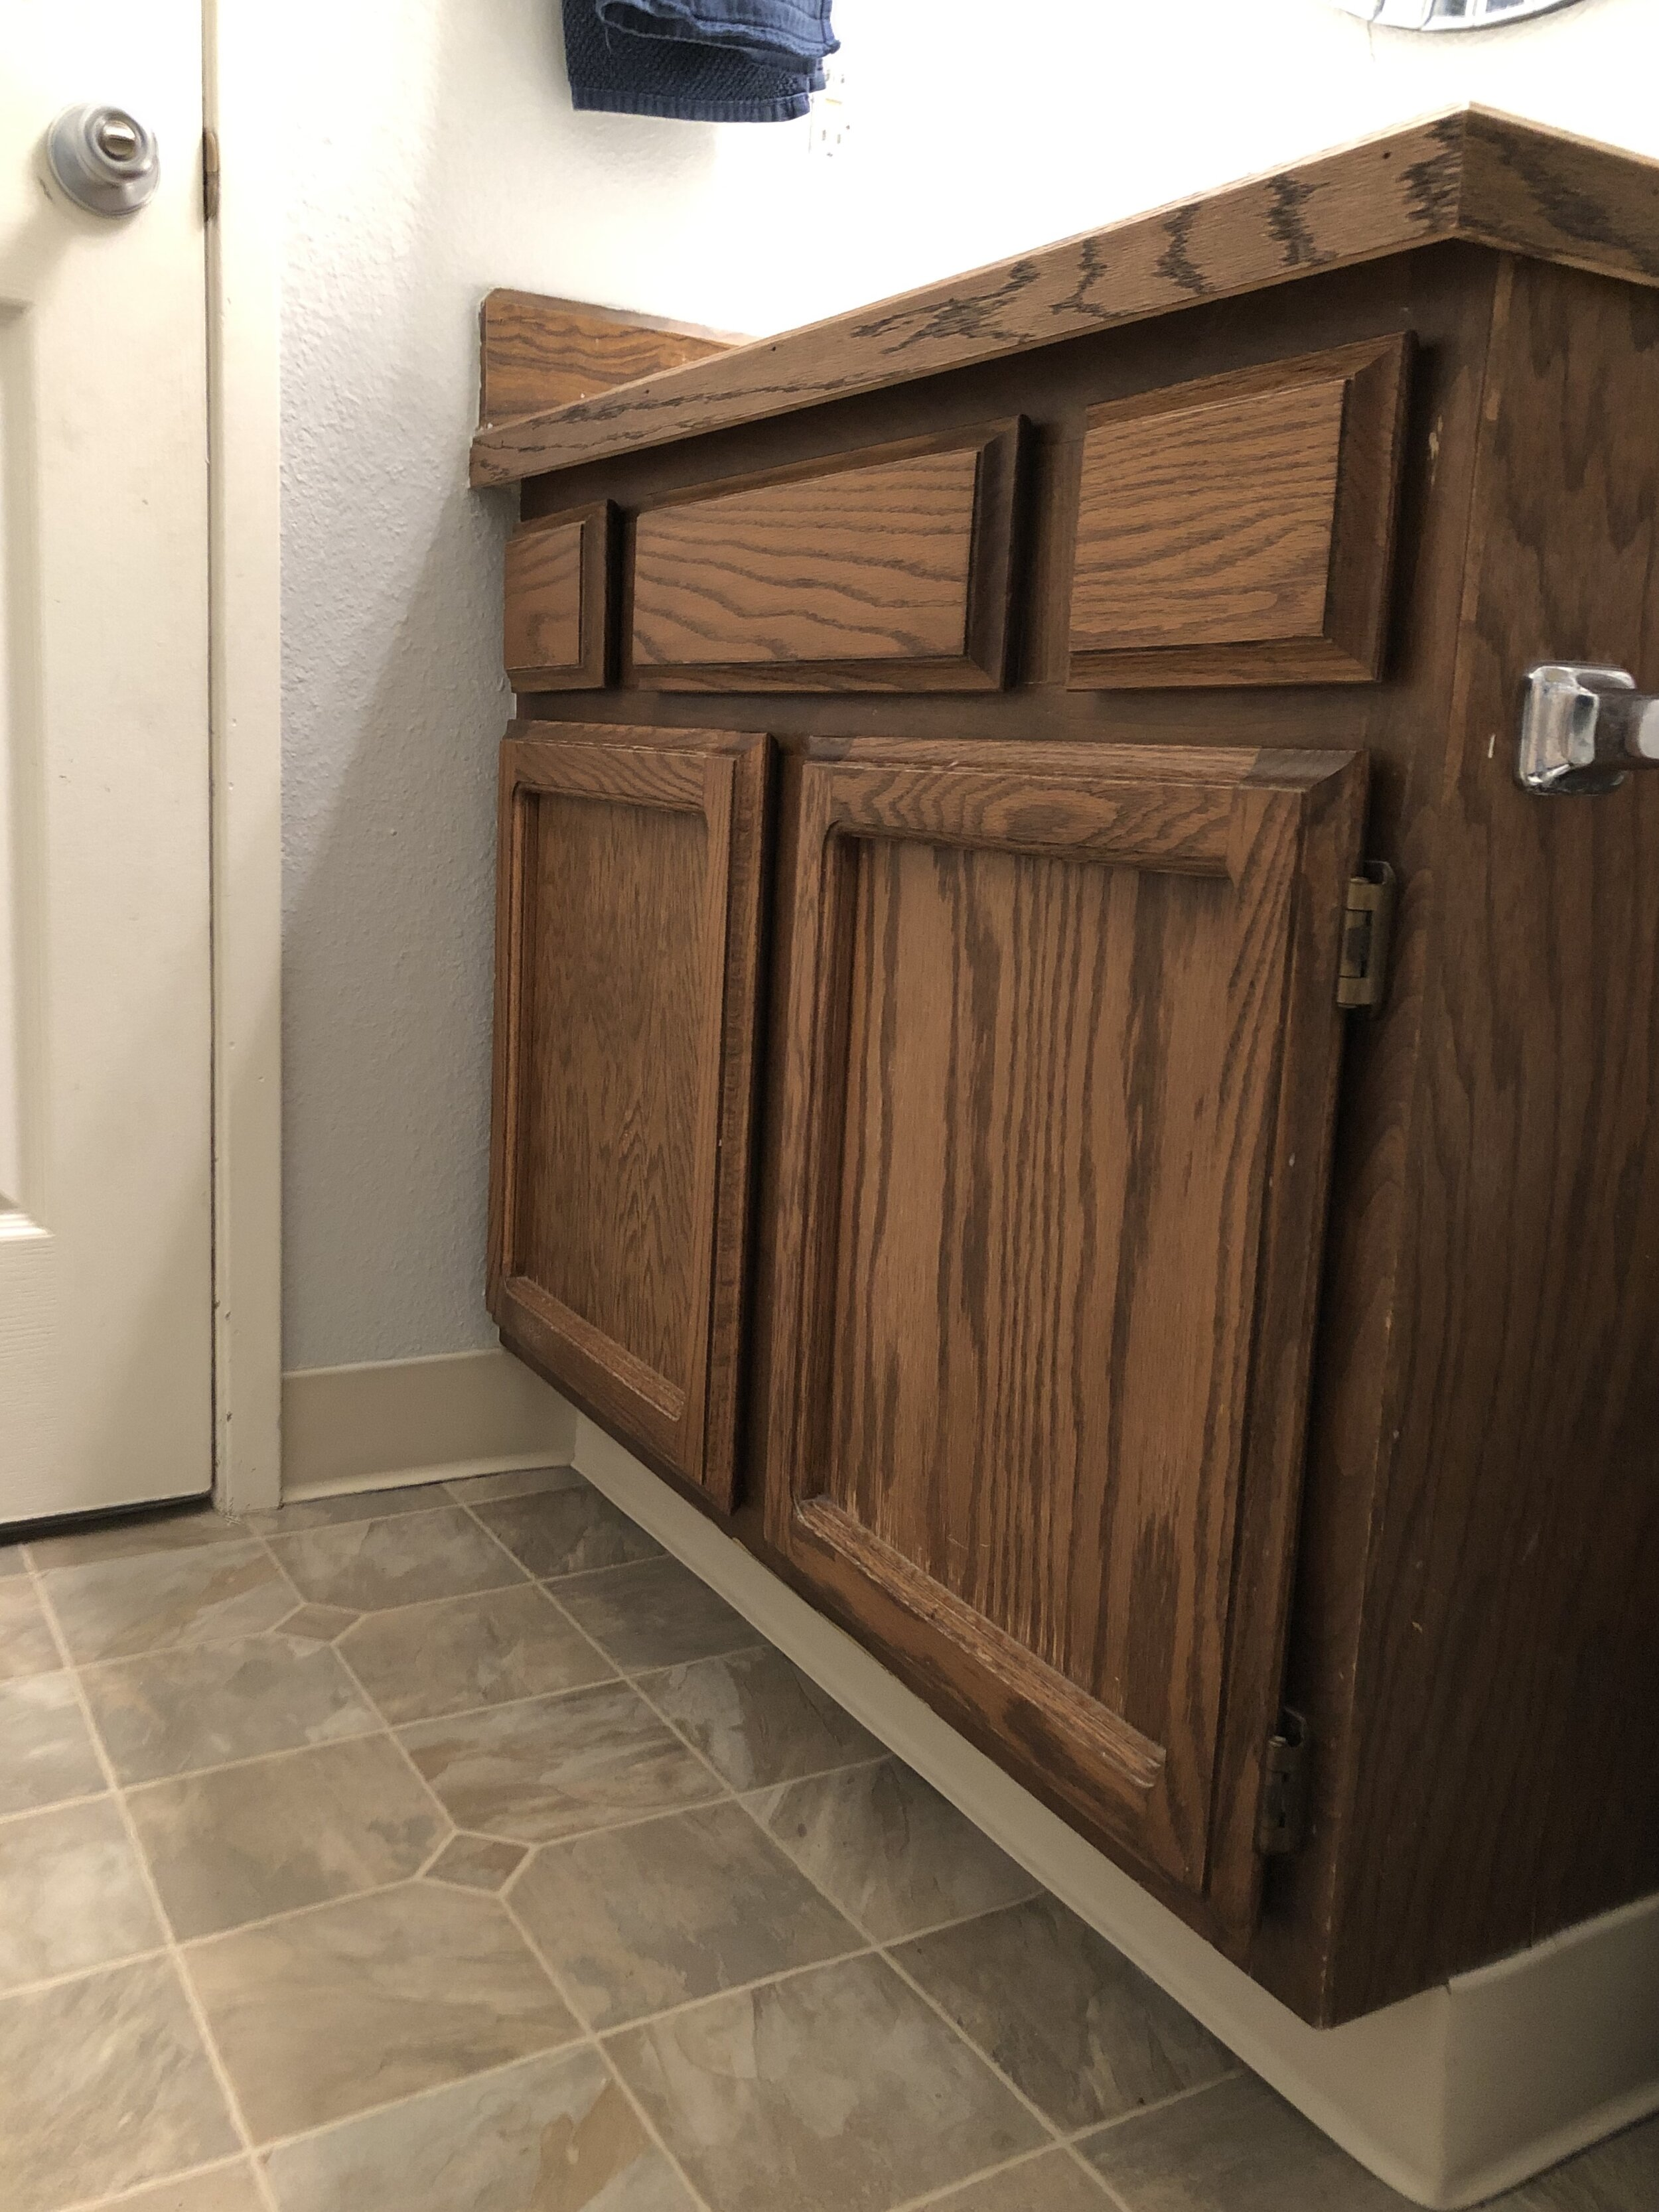 One Room Challenge, Wk 1: My Boys' Bathroom- Inspiration & Before Photos